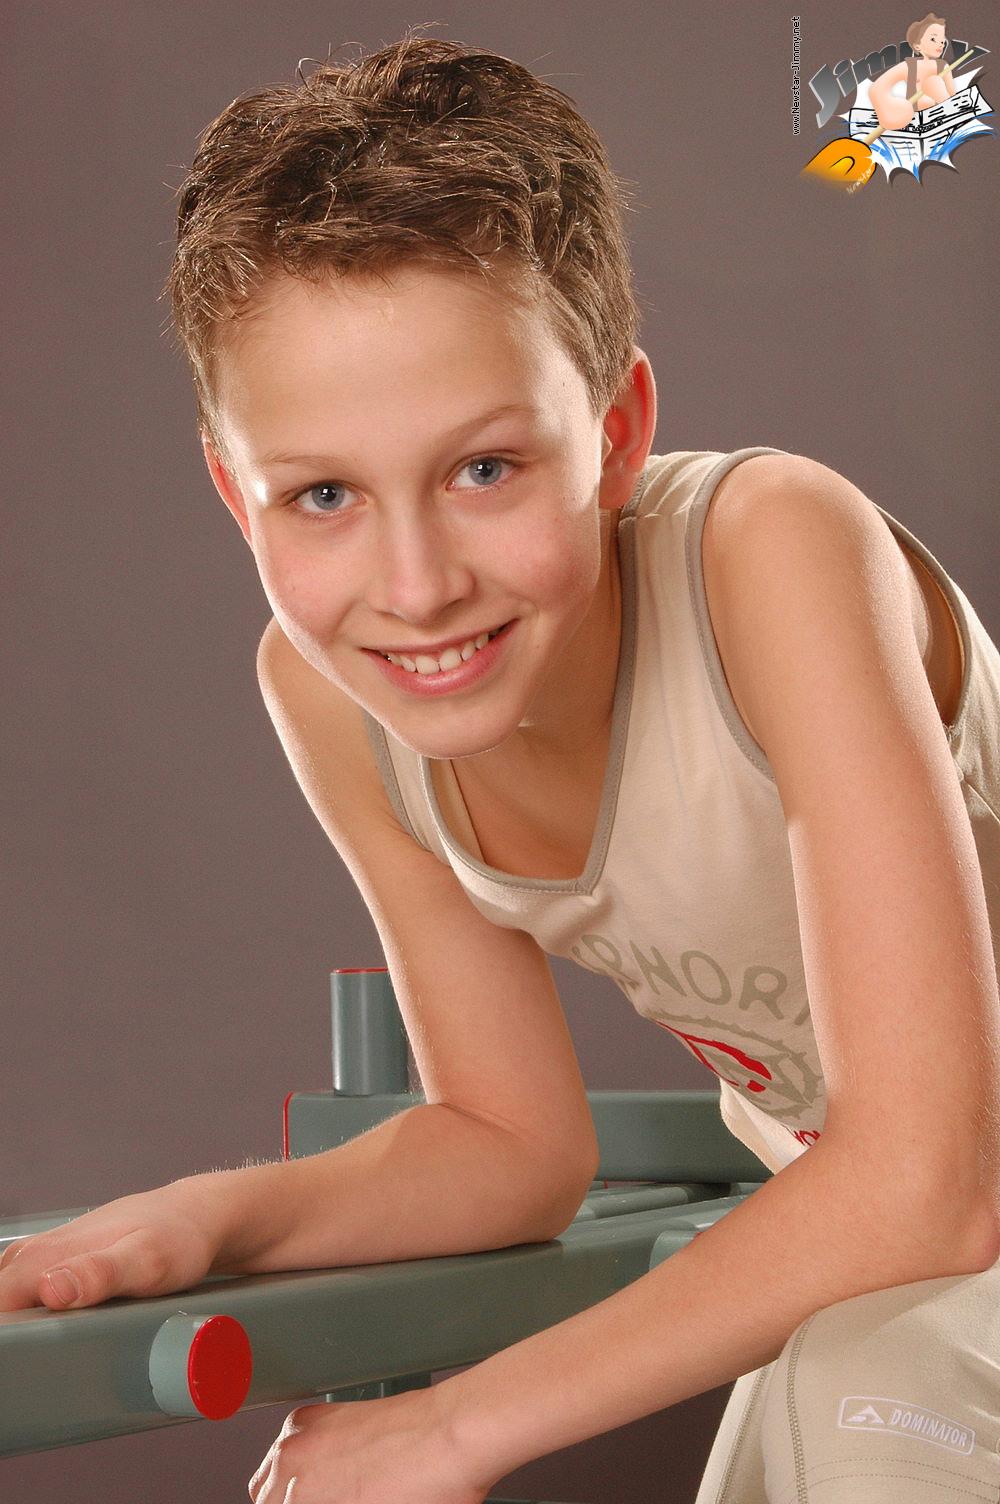 Newstar Jimmy Set Romain Boy Model Kootation Picture